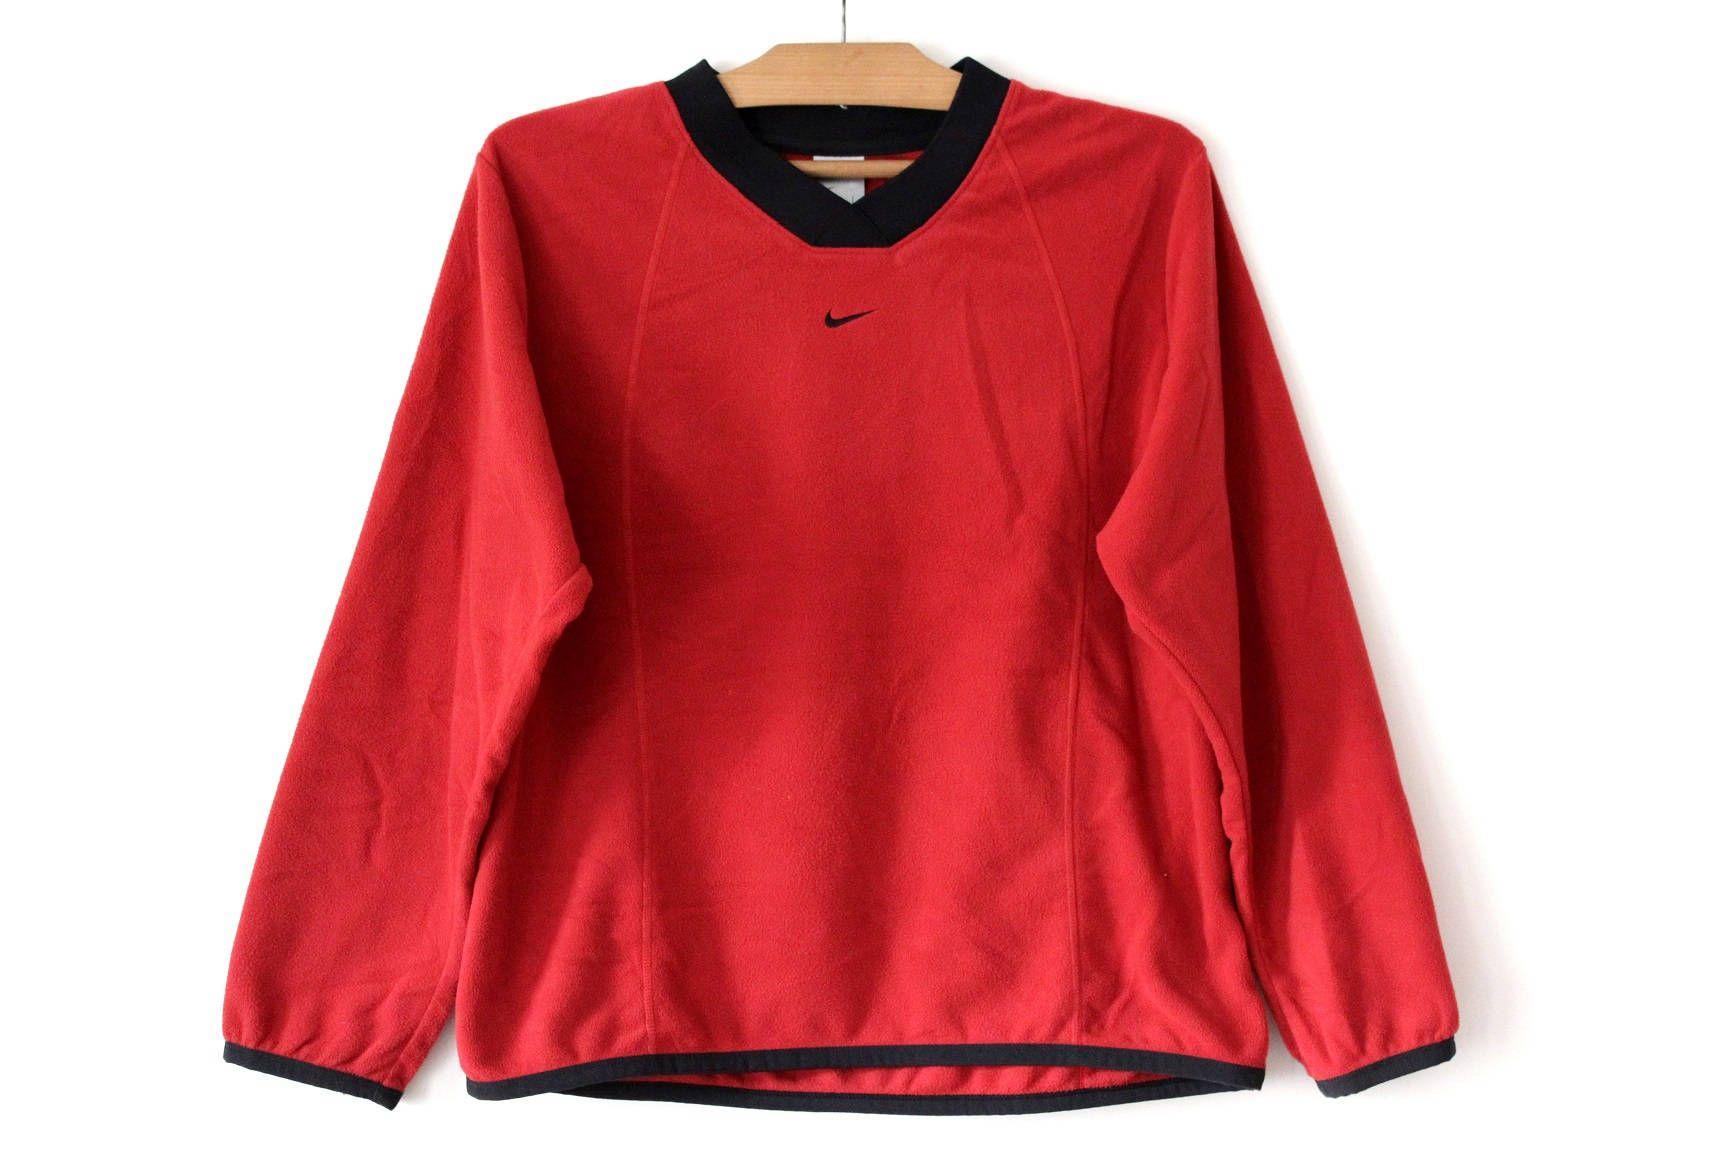 90 S Nike Sweatshirt Vintage Nike Fleece Jumper Red Nike Hip Hop Streetwear Nike Pullover Nike Tennis Nike Running Sweater Adidas Sport Pants Nike Fleece